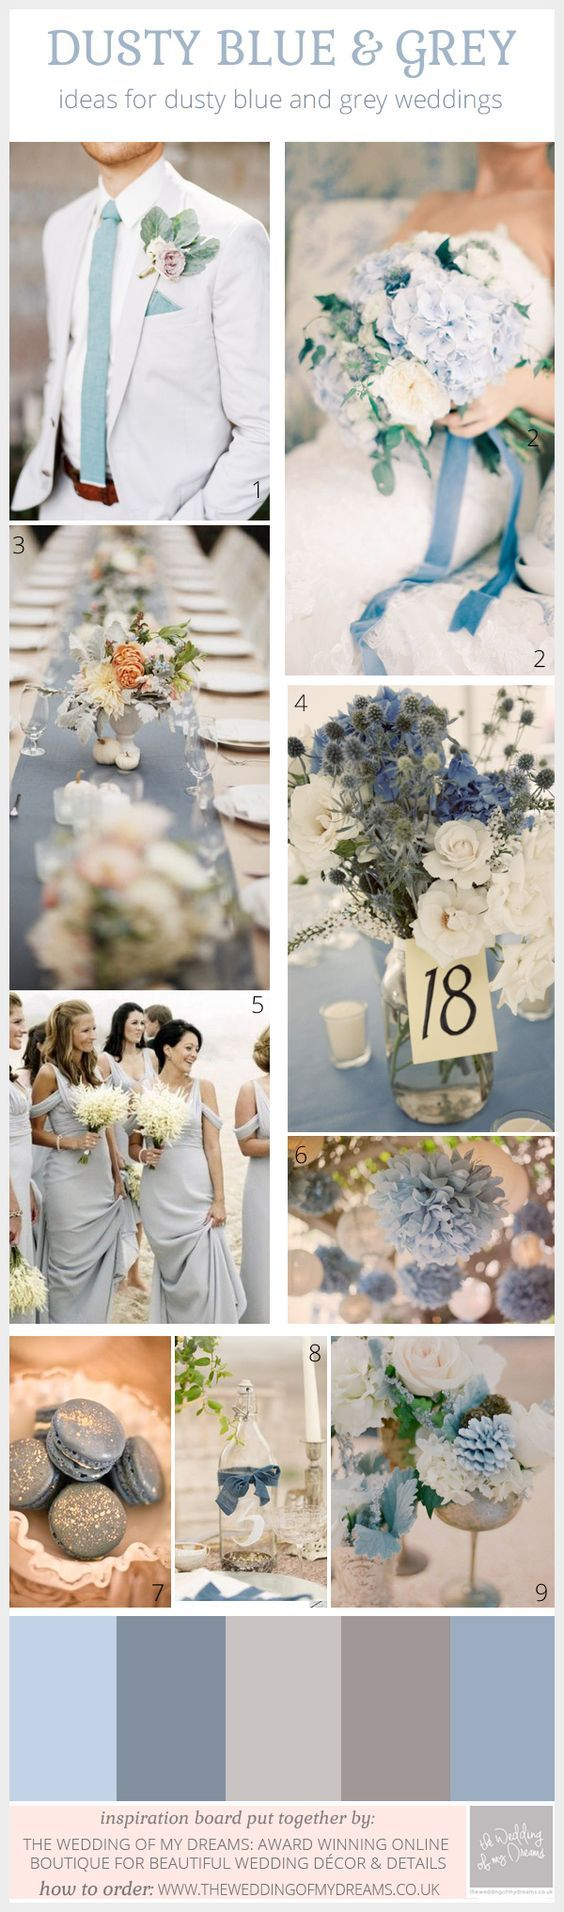 Light blue wedding decoration ideas  Dusty Blue And Grey Wedding Ideas u Inspiration  wedding